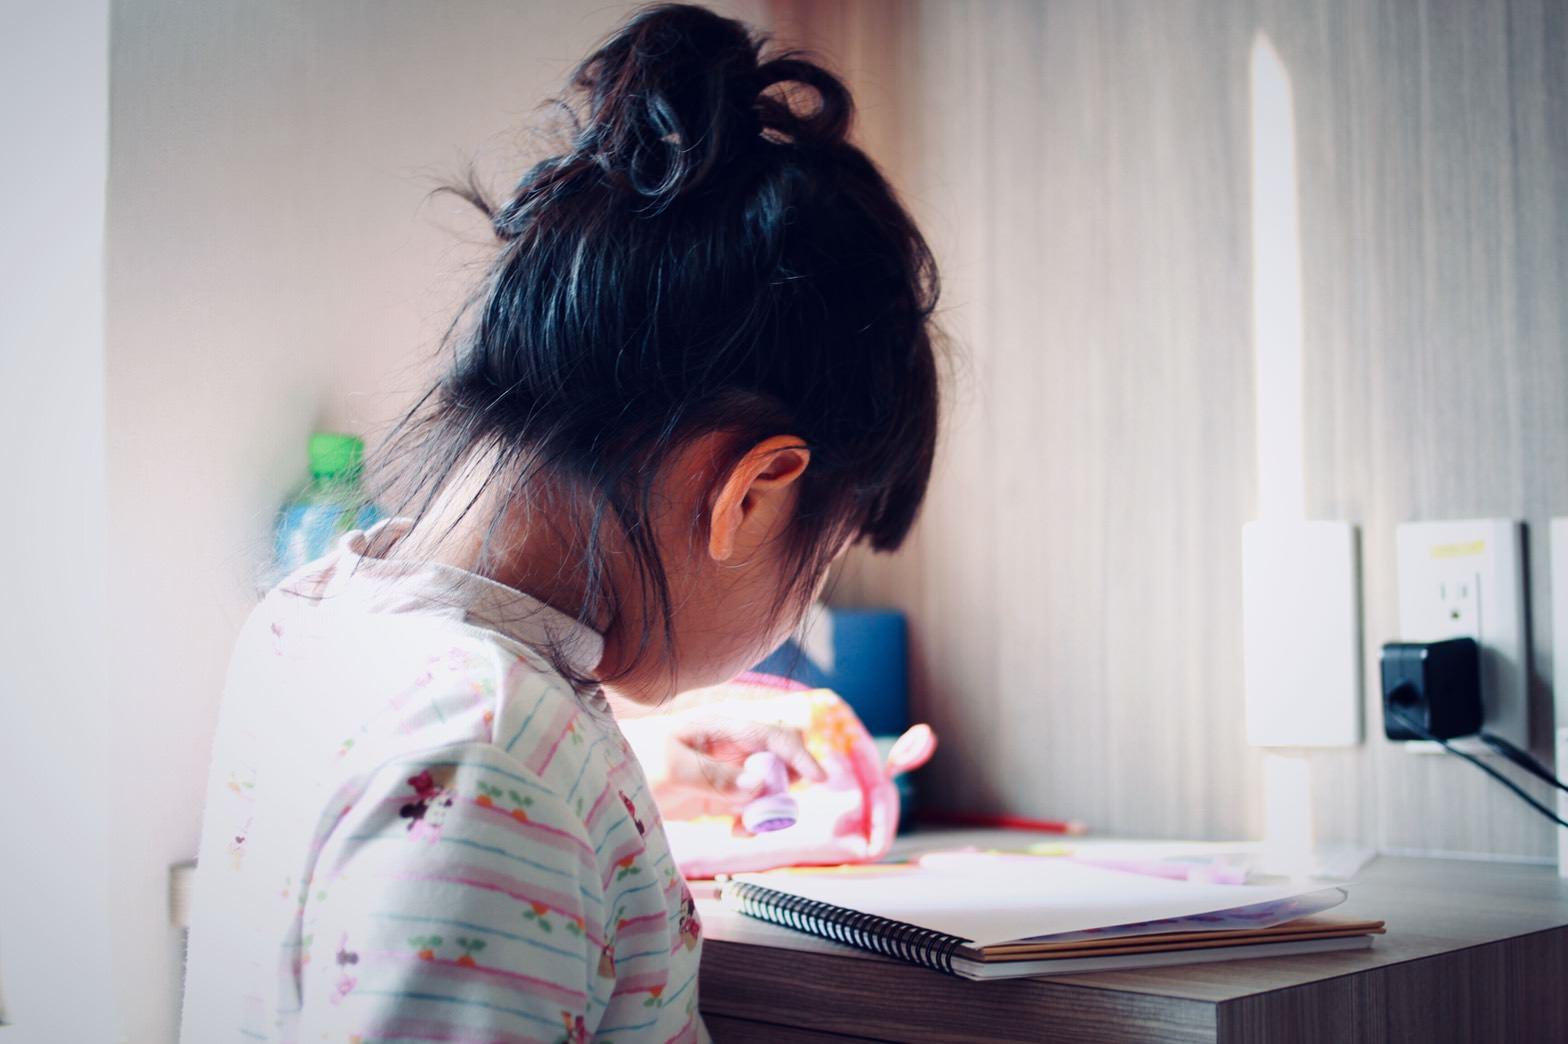 【Yumi生病日記】Yumi輕微感冒轉變成肺炎要住院觀察去